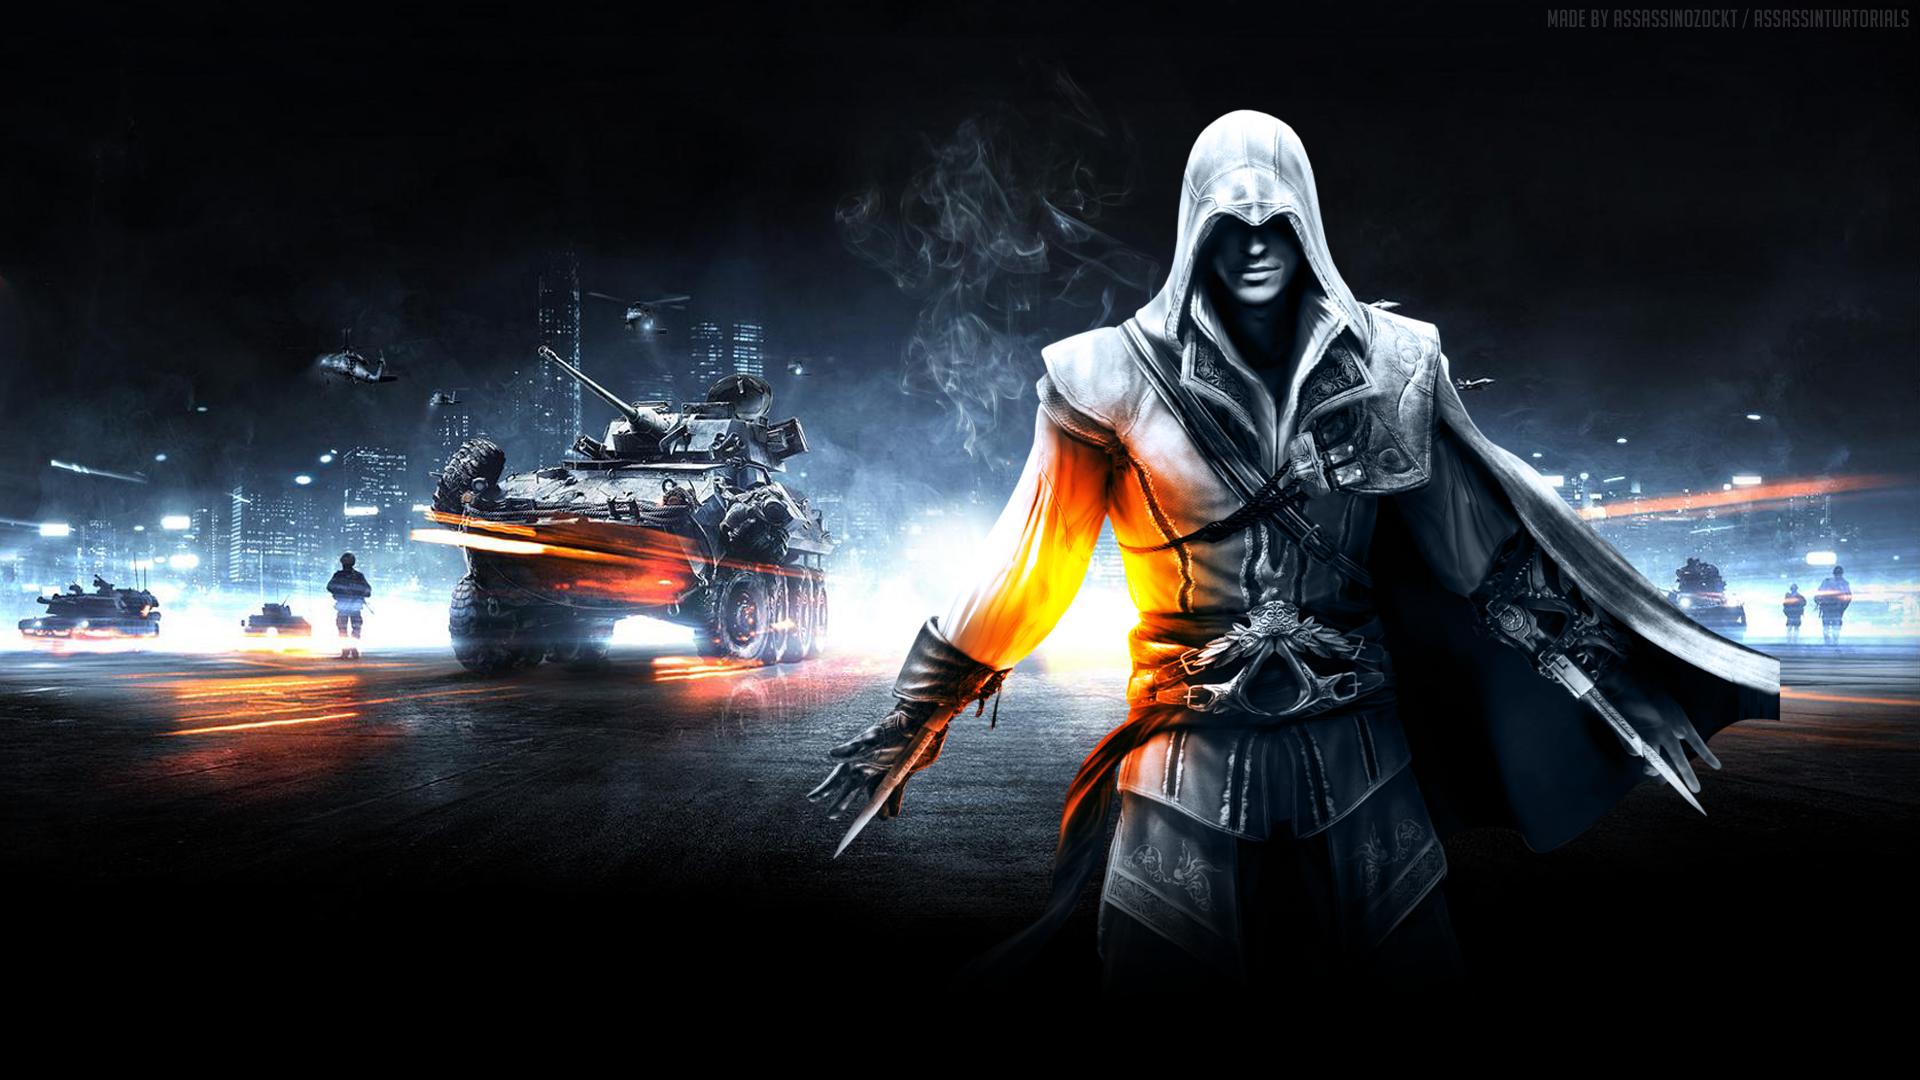 Video Game   Collage Assassins Creed Battlefield Wallpaper 1920x1080